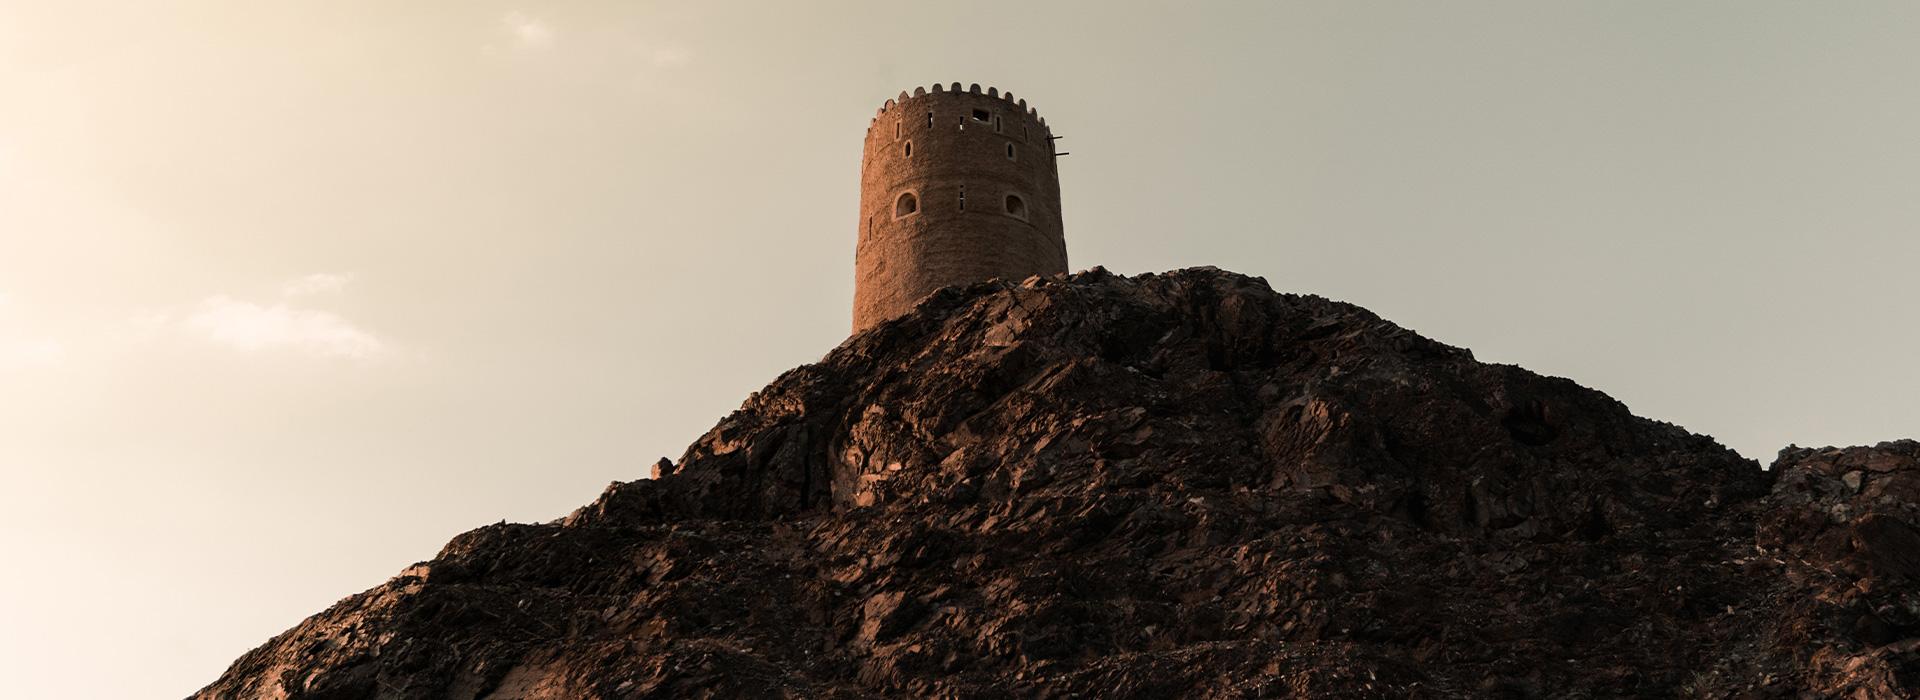 Reisen nach Oman - Individuelle Reisen nach Oman - Harry Kolb AG - Tourismus